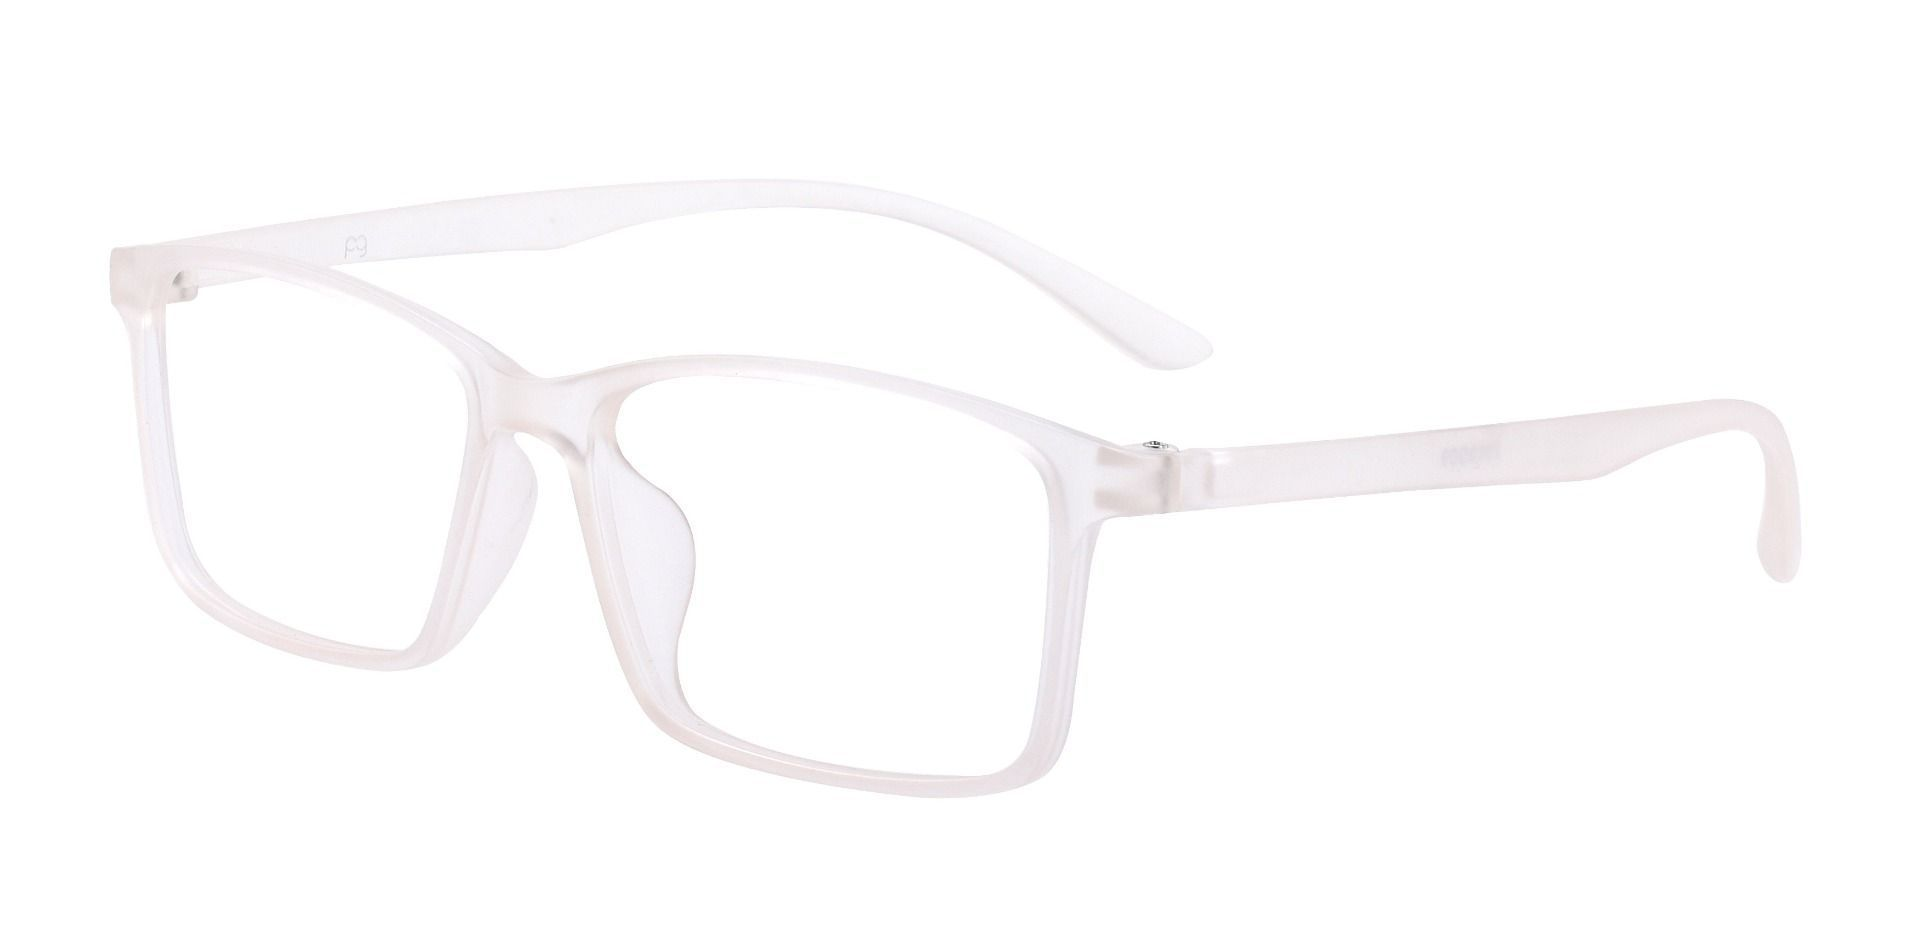 Horizon Rectangle Prescription Glasses - Gray